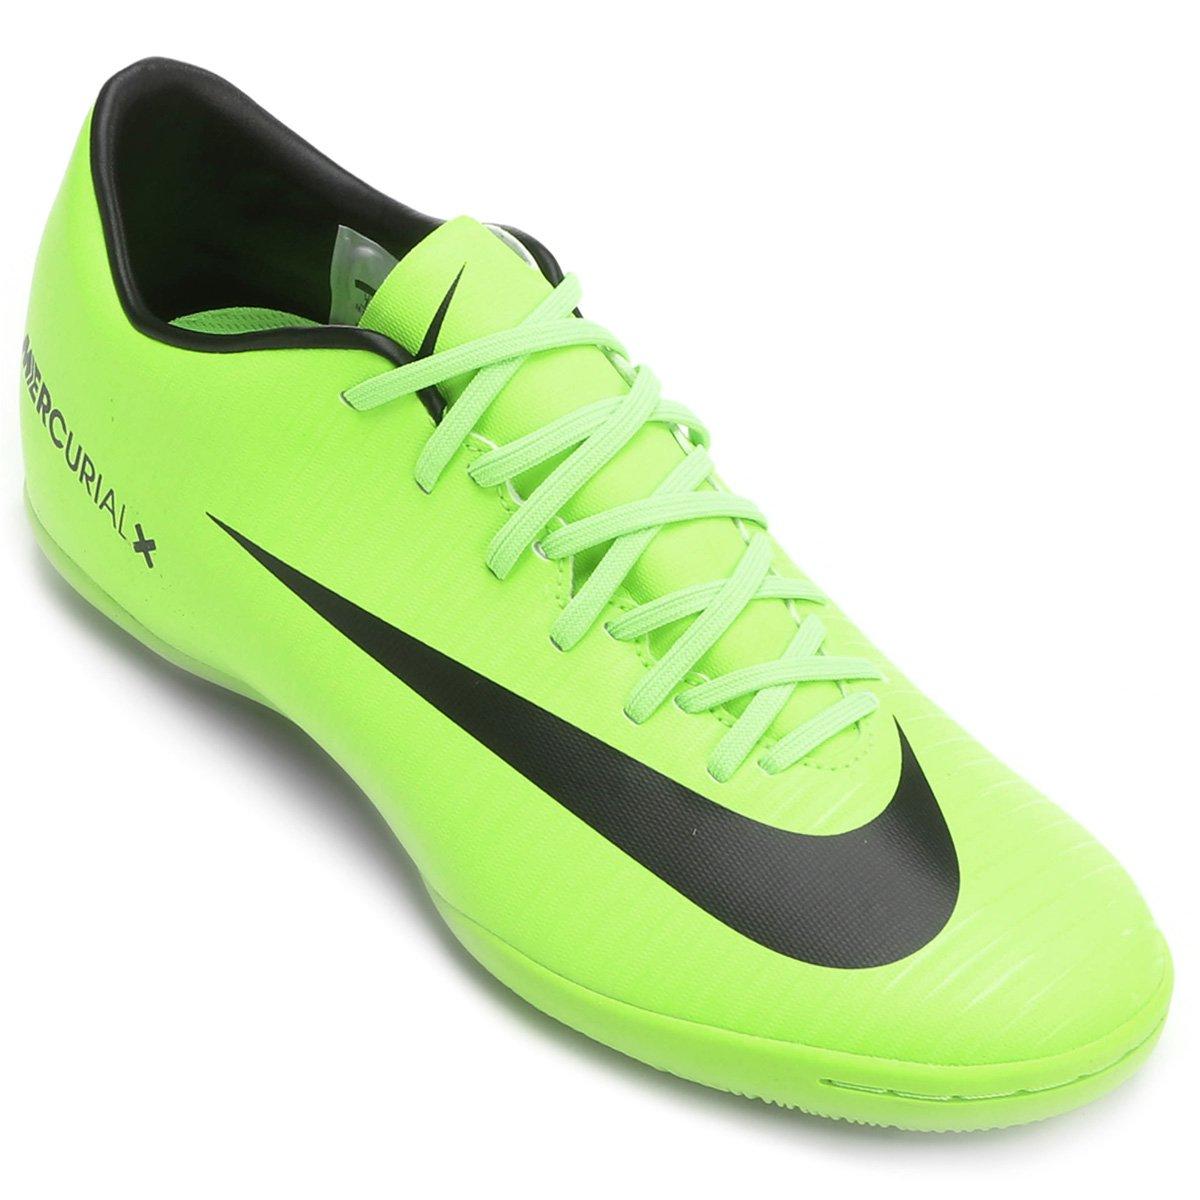 8a4b0f2fdf Chuteira Futsal Nike Mercurial Victory 6 IC - Compre Agora